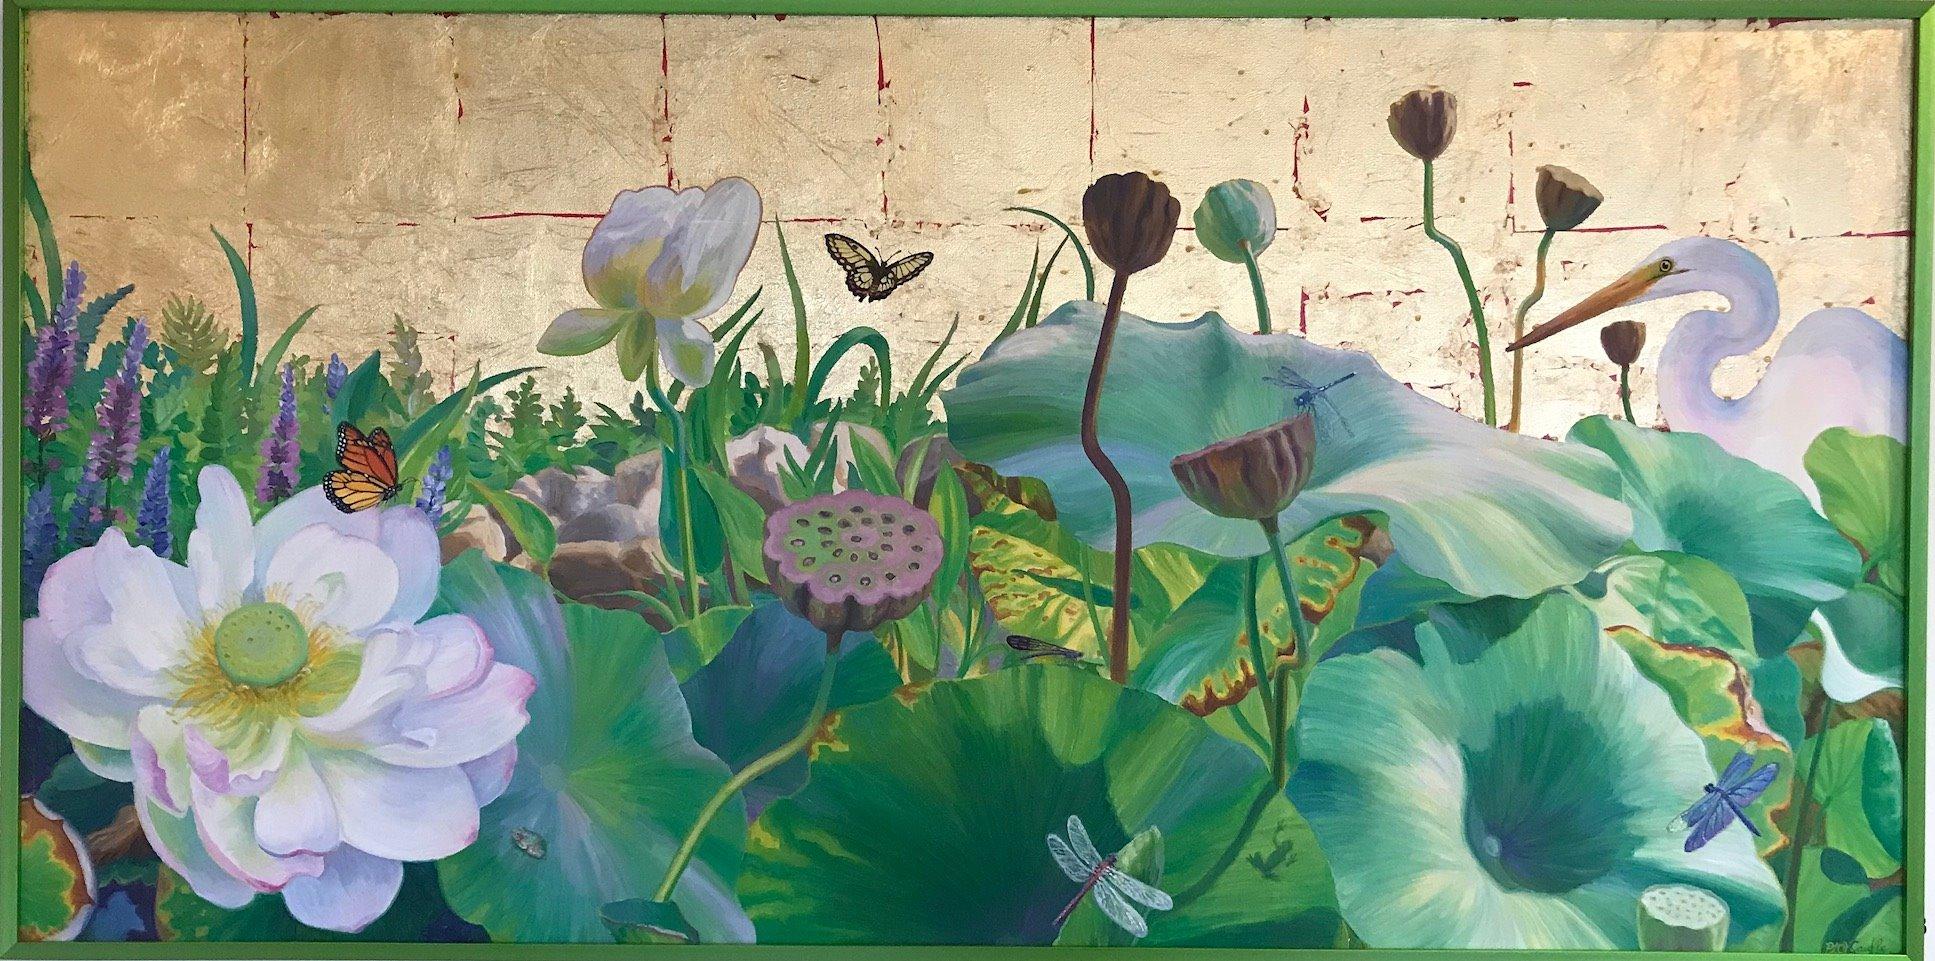 Lotus Pond - Penny Hauffe